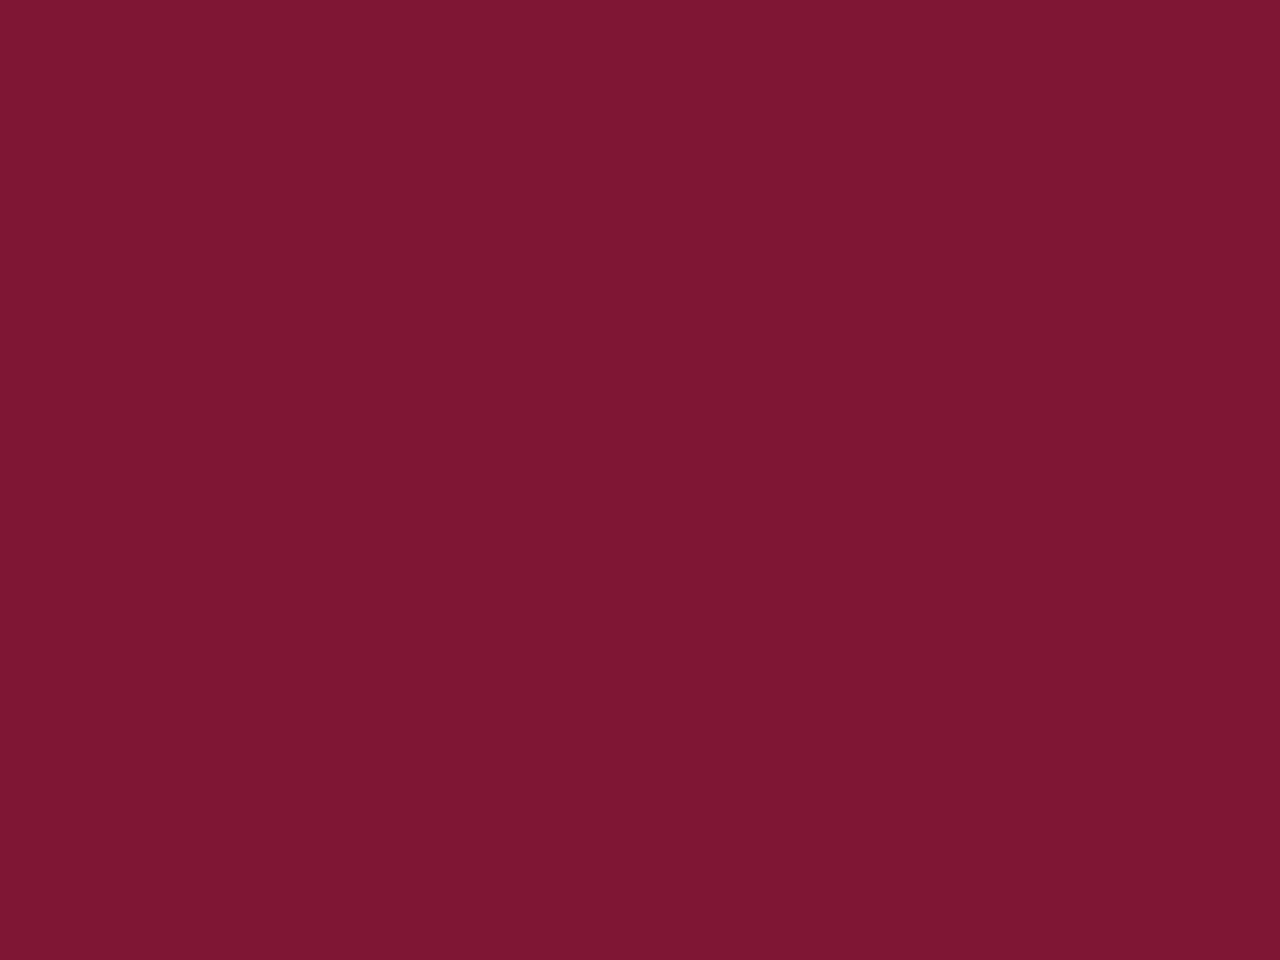 1280x960 Claret Solid Color Background